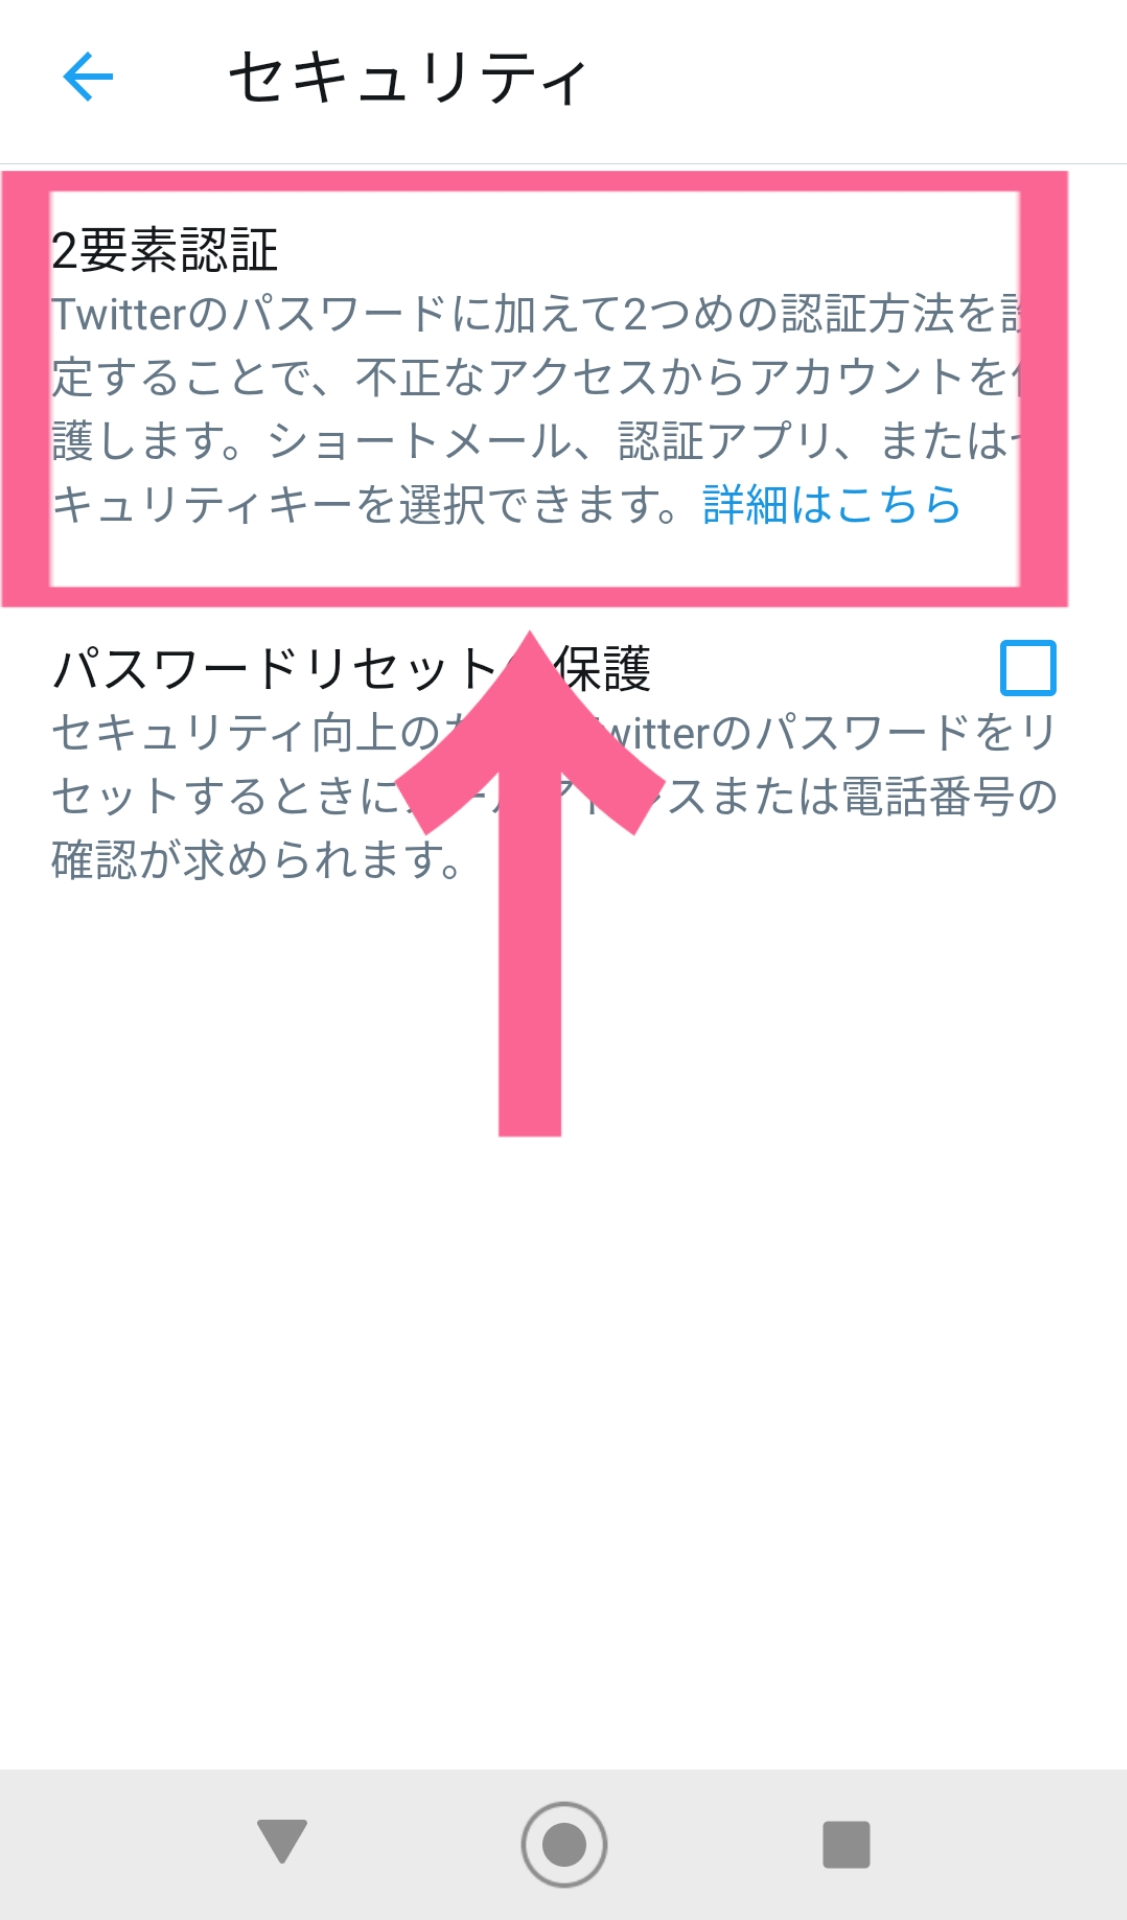 Twitter 設定 セキュリティ 2要素認証 2段階認証 タップ